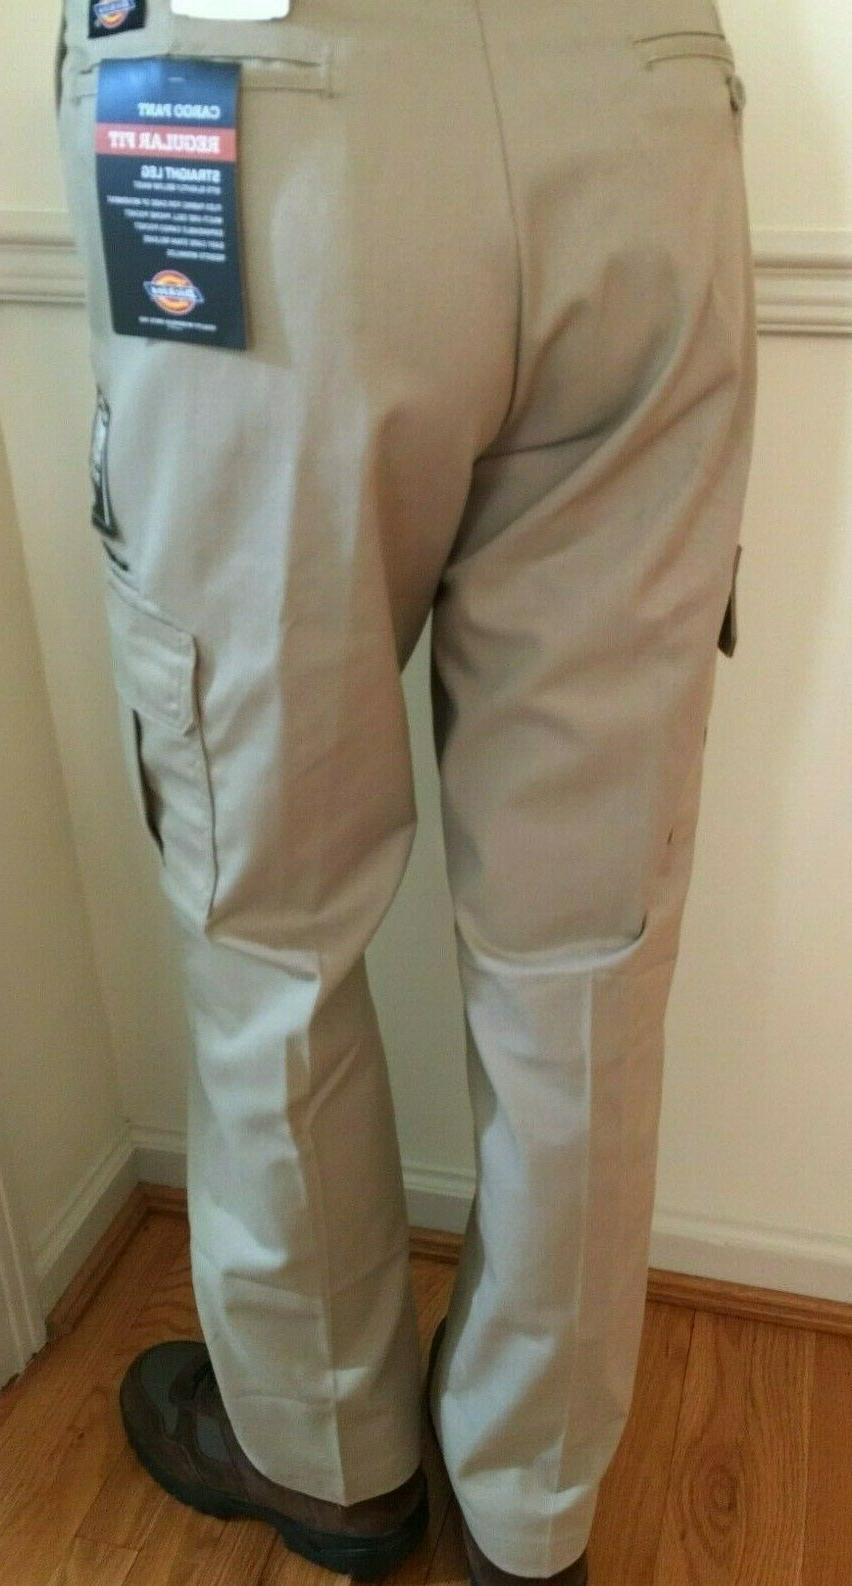 NWT MEN'S Flex DP Fit Work Pants Slacks